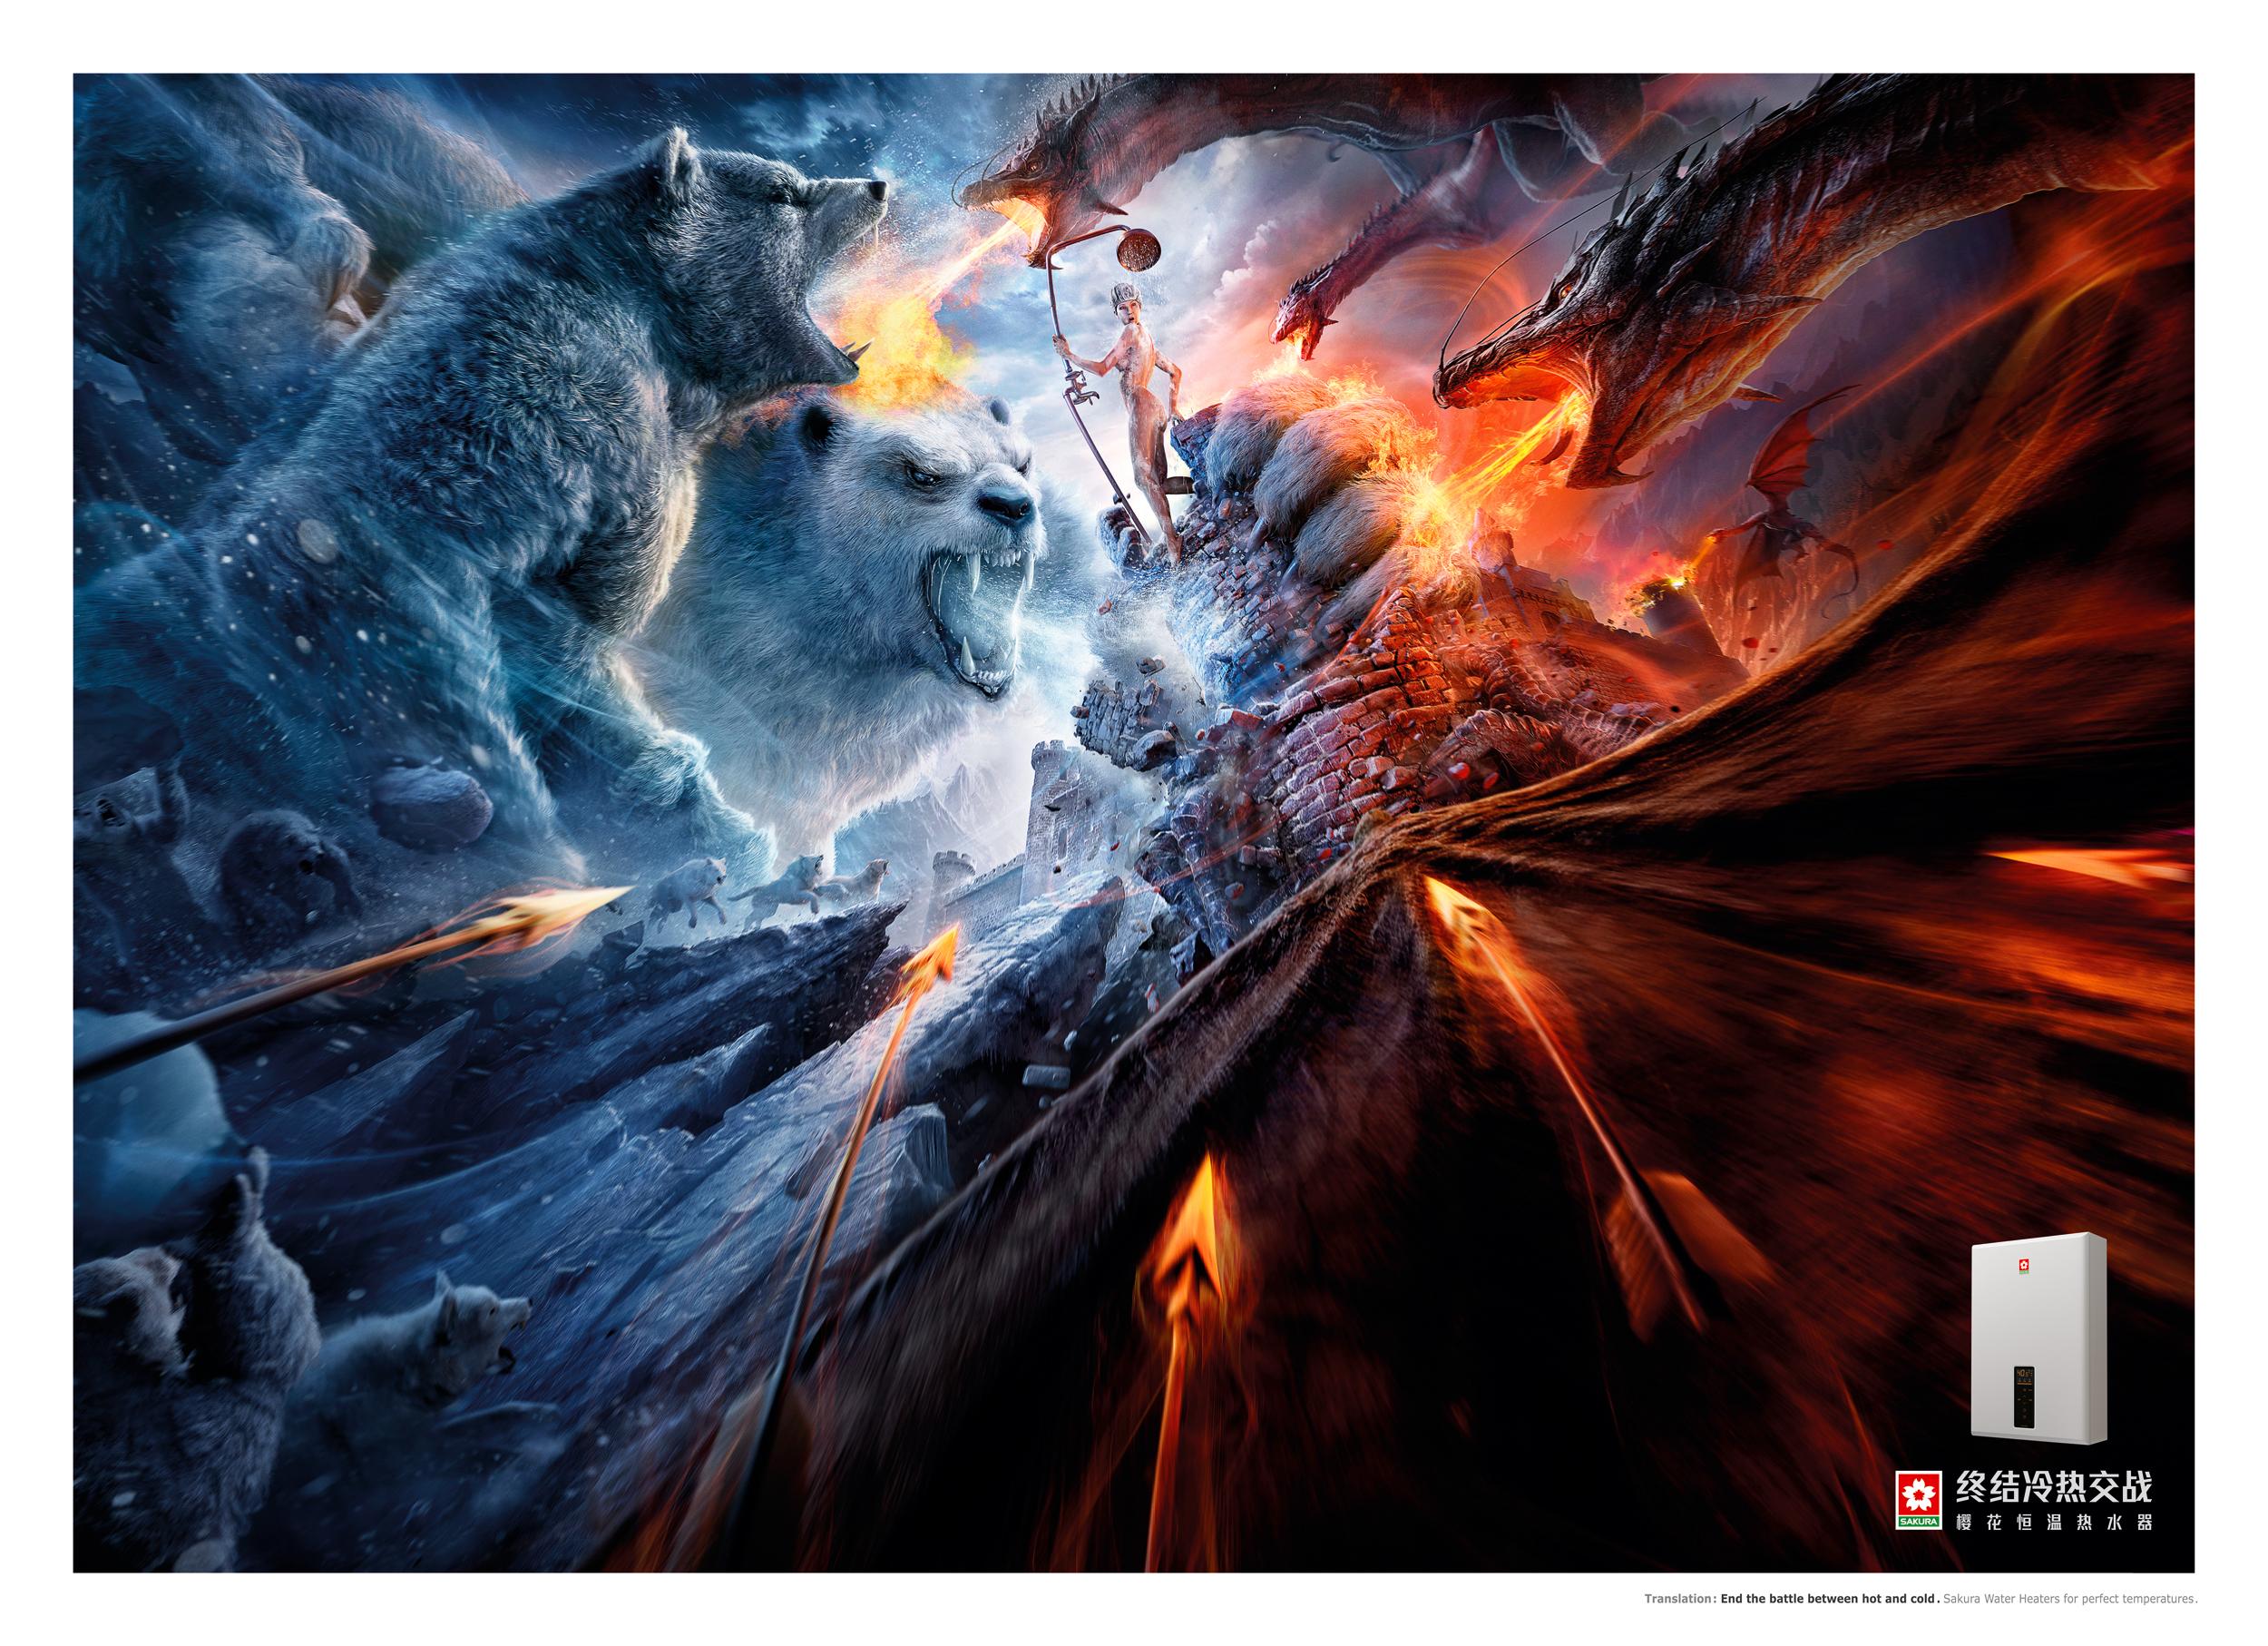 A_Bear VS Dragon_Srgb.jpg